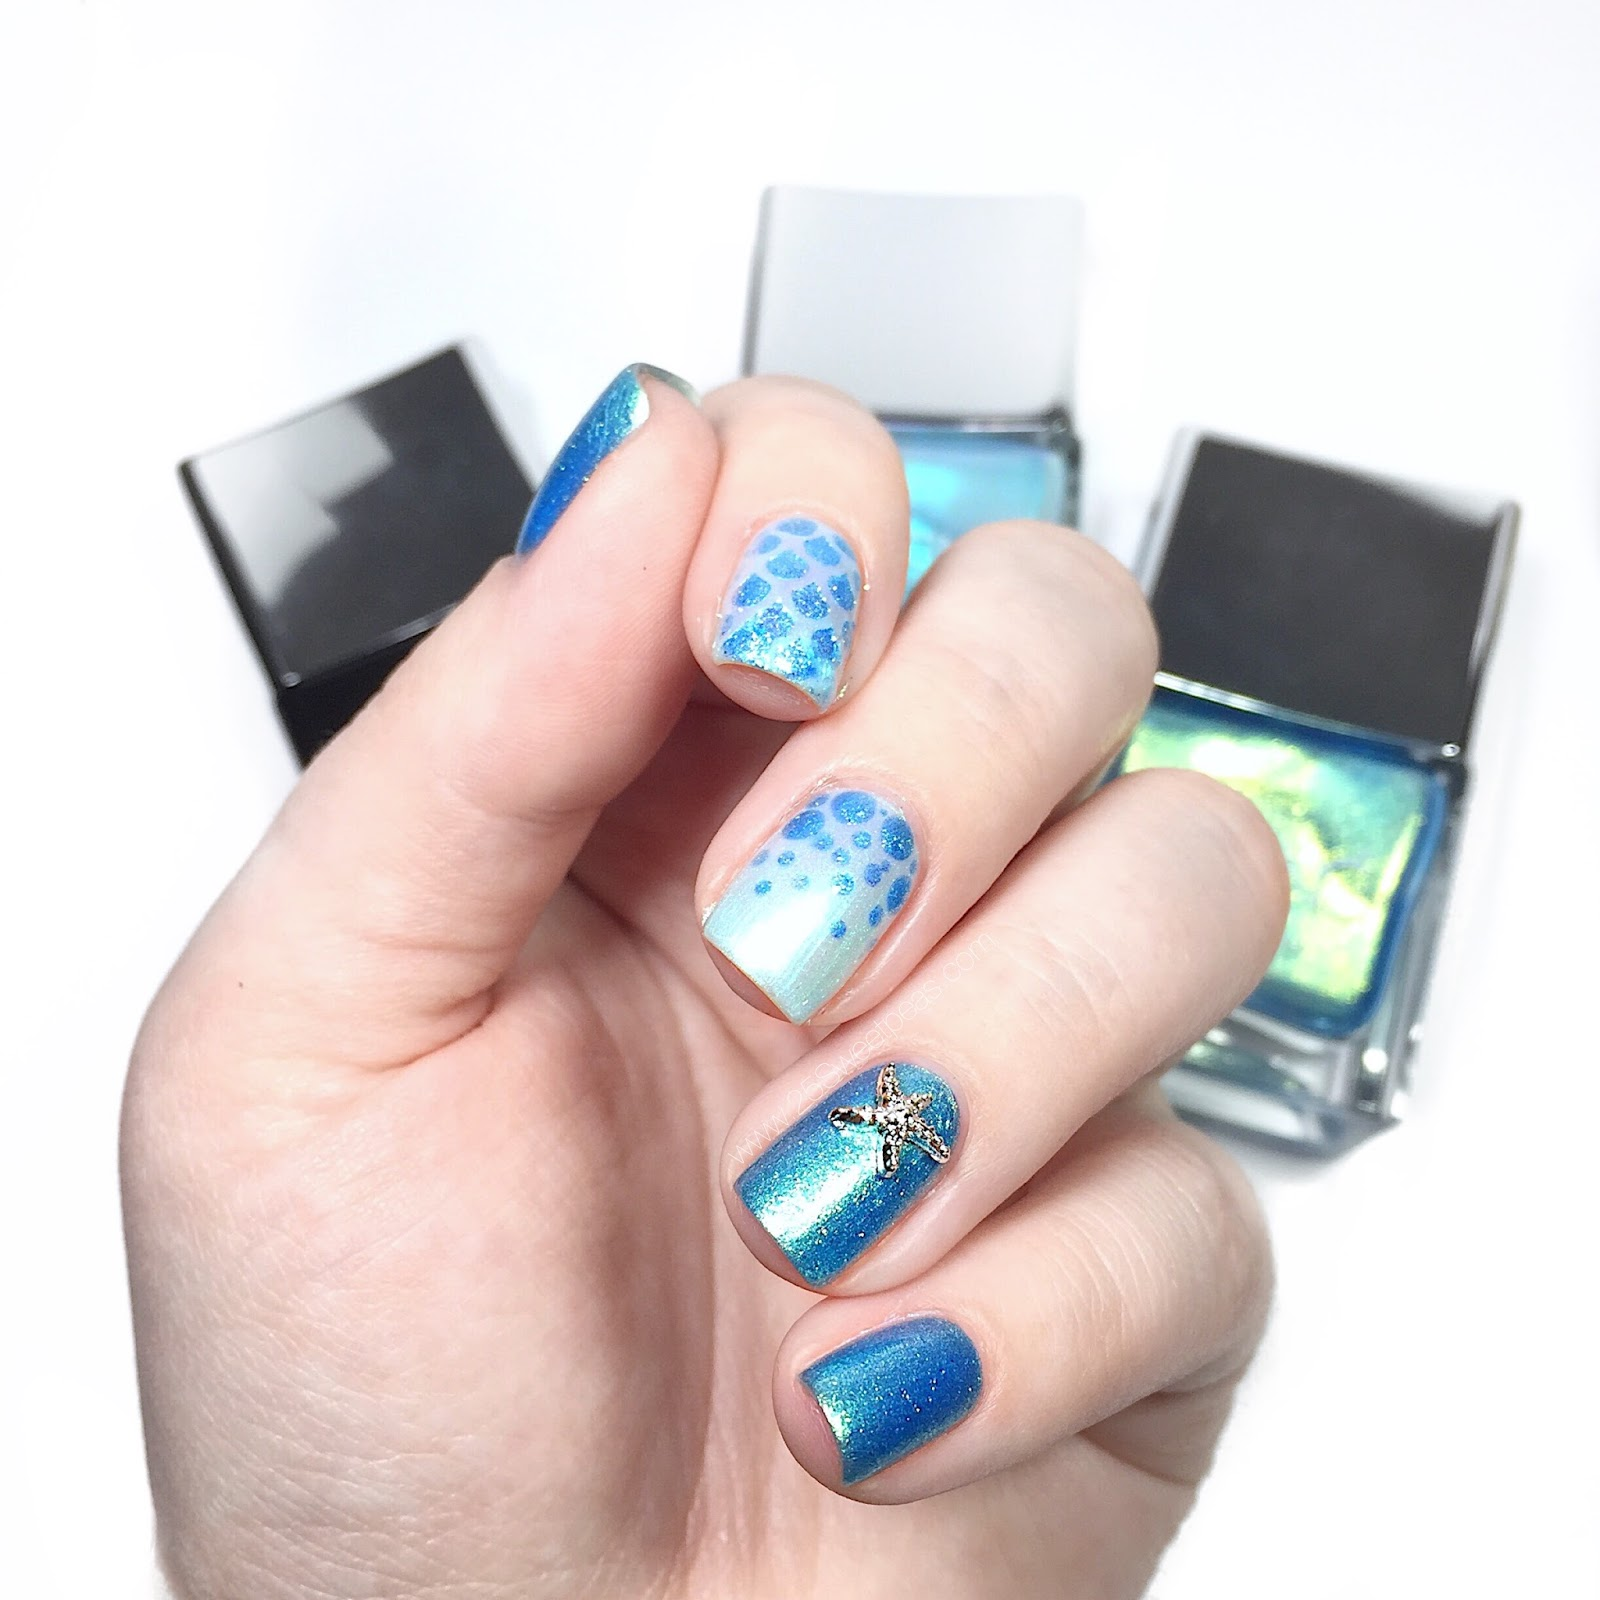 Nails Inc Self Made Mermaid Duo